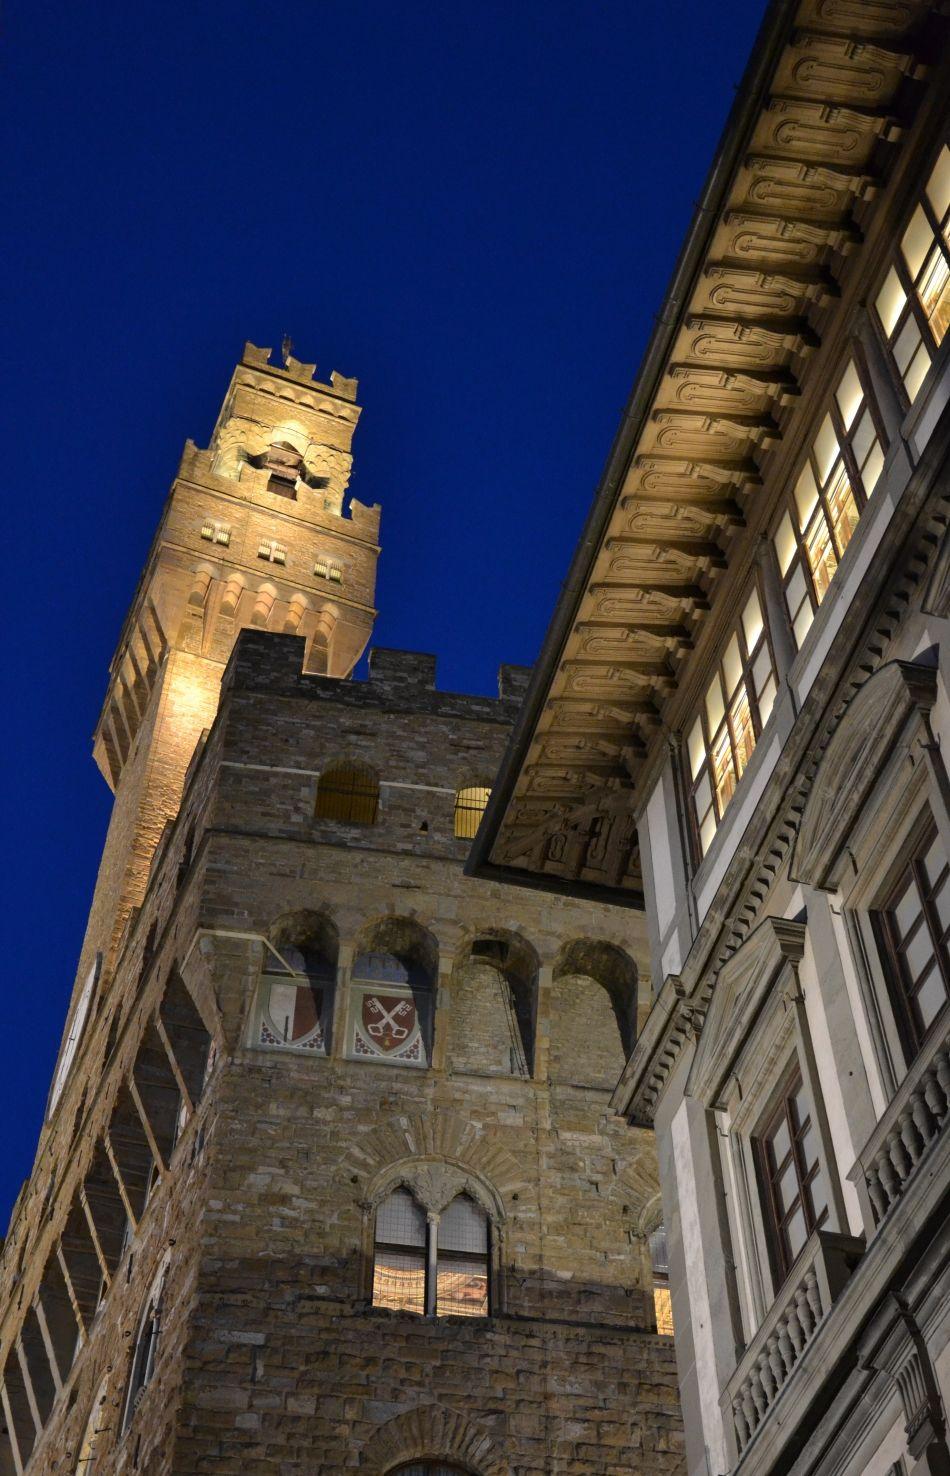 Photoblog Contest Photo: palazzosignoriafirenze.jpg   Life Beyond Tourism